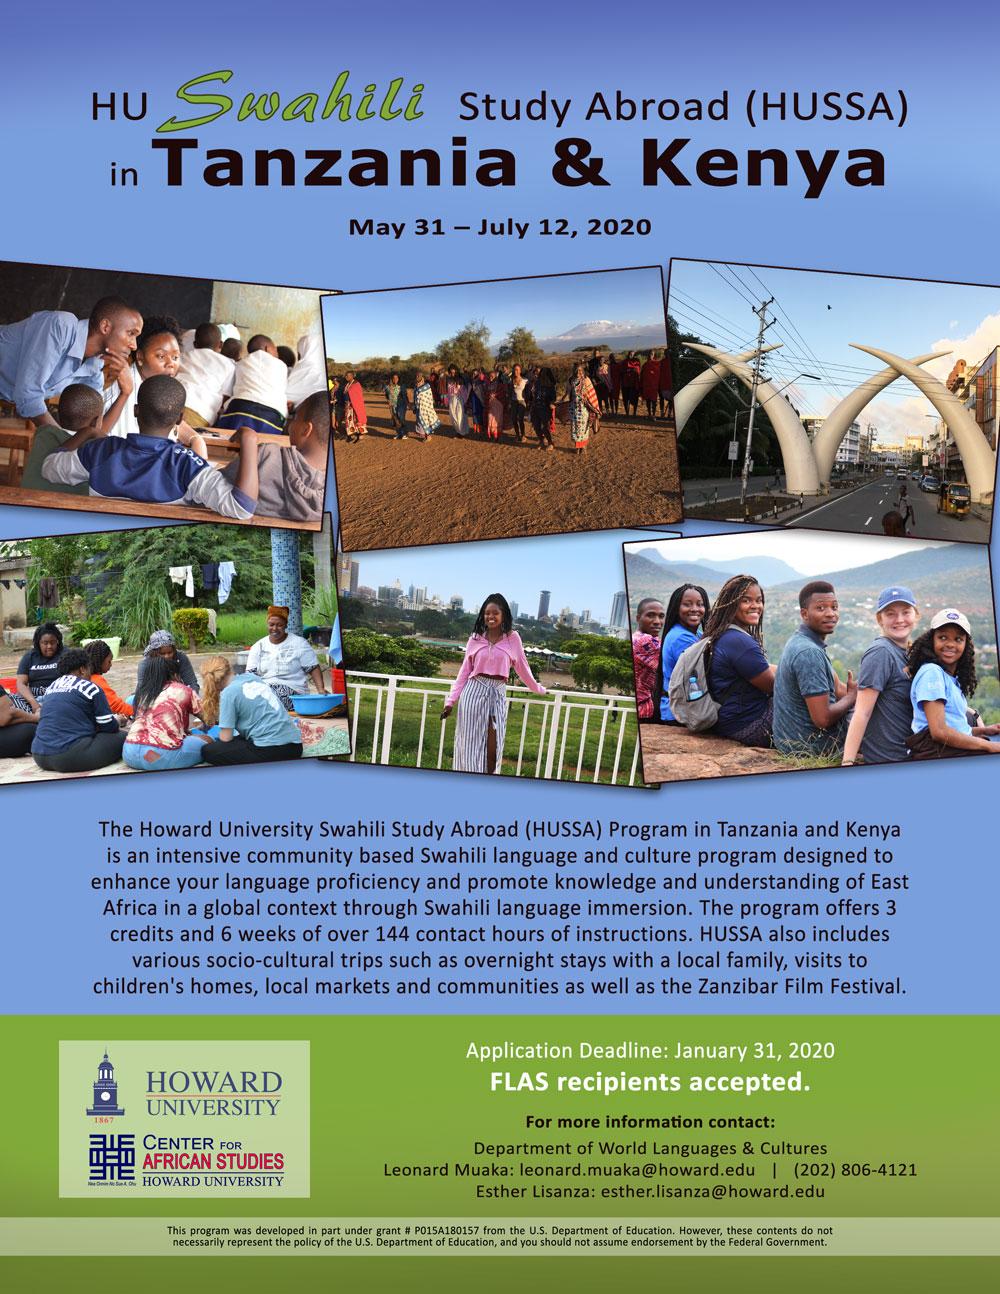 HU-Swahili-Study-Abroad-HUSSA-Program-2020